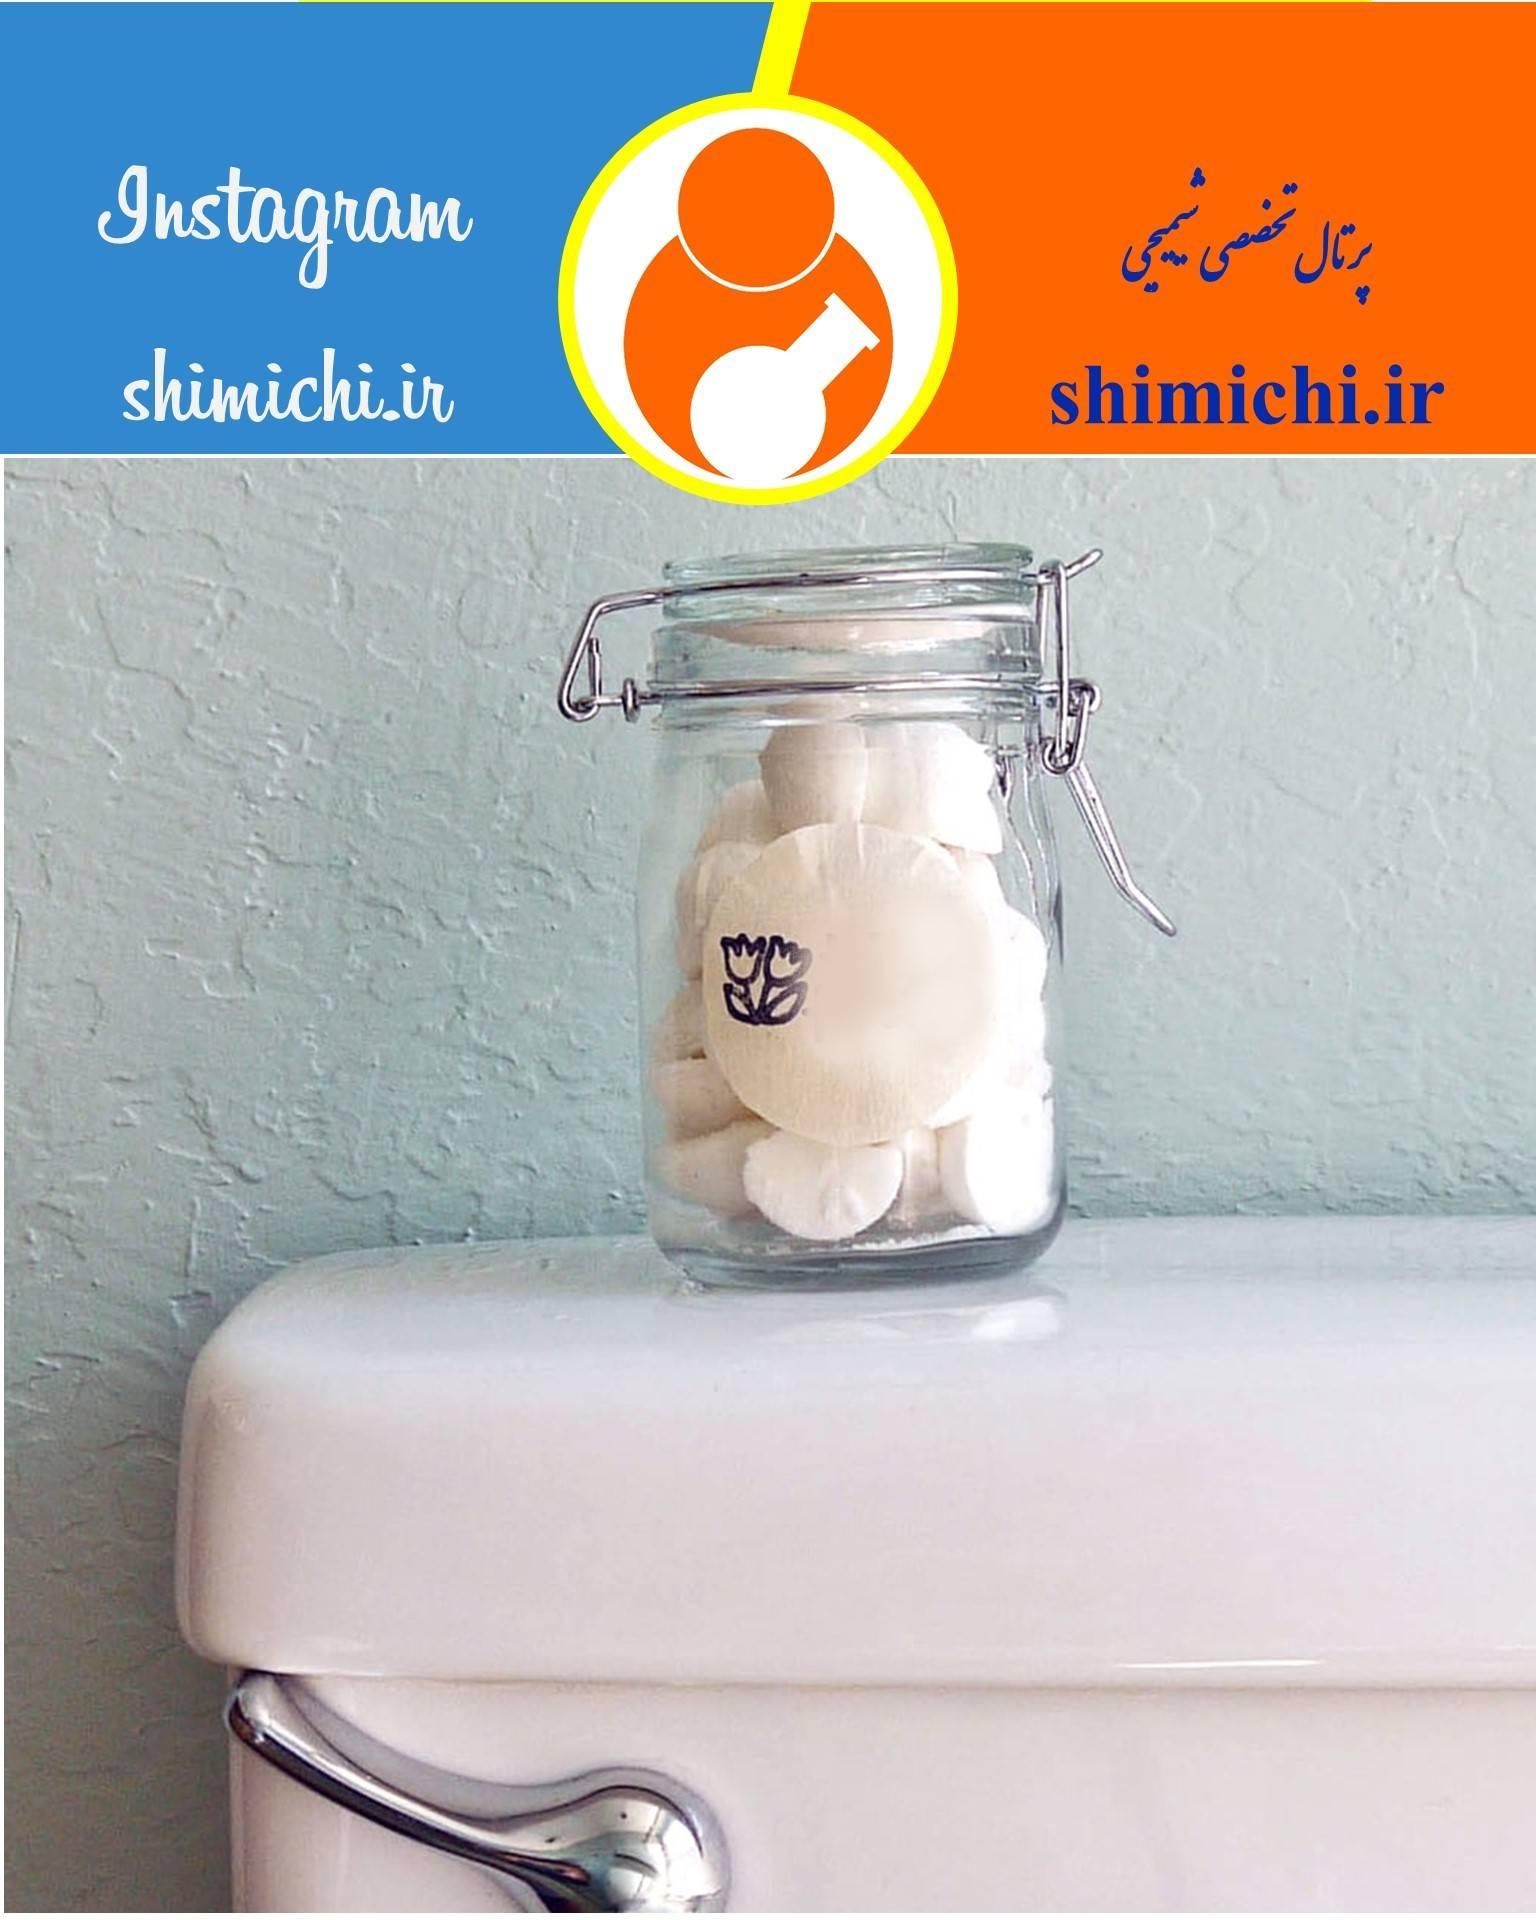 Homemade-Toilet-Bomb-Fizzies قرص خوشبو کننده و ضدعفونی کننده ی فلاش تانک